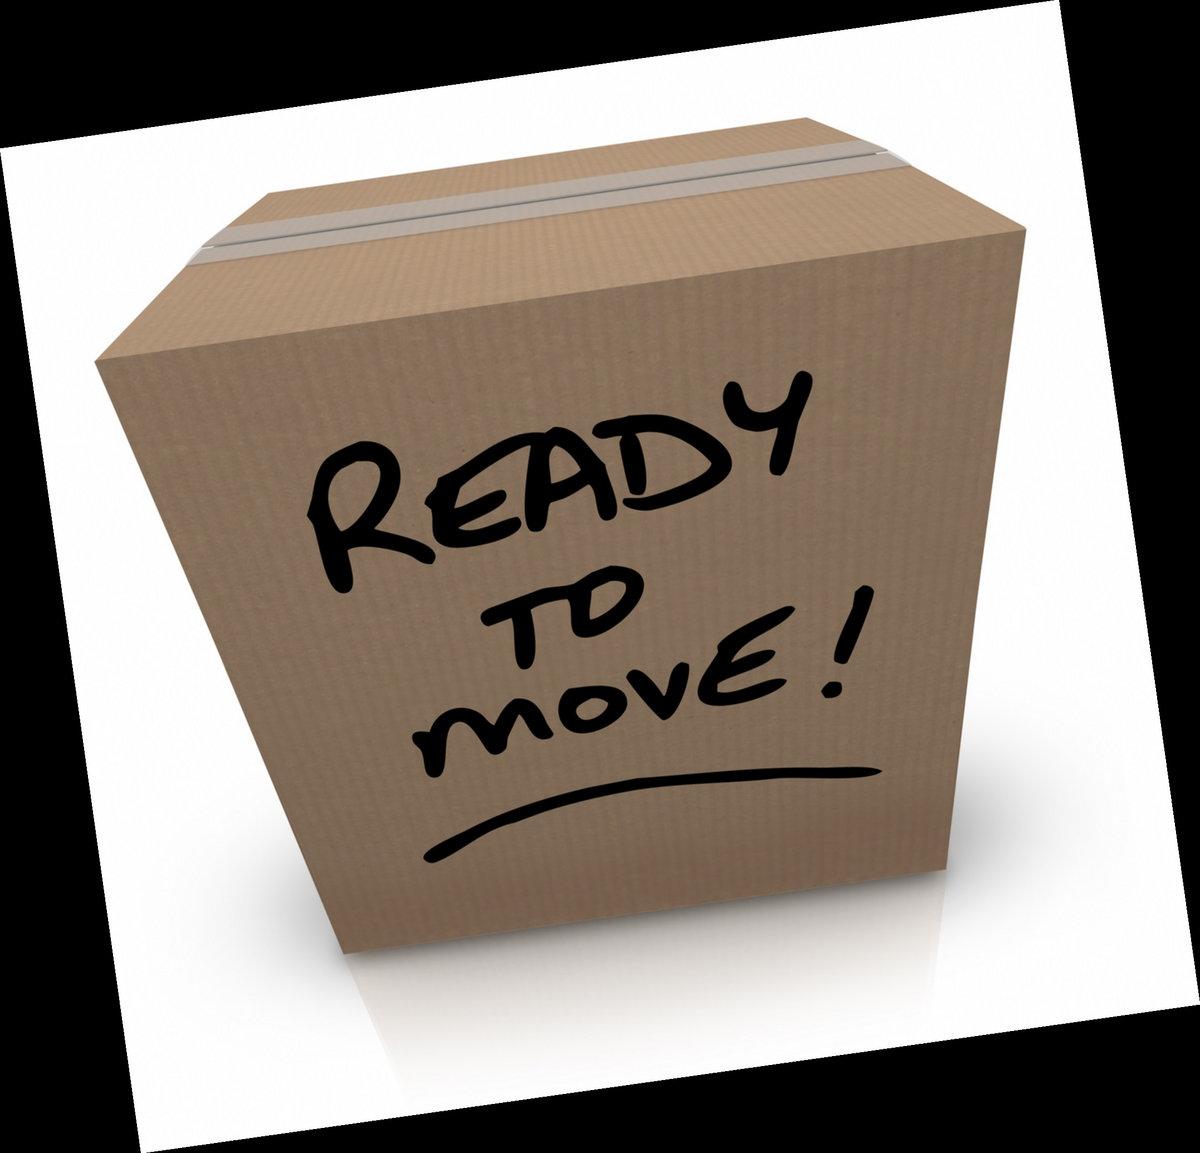 self moving companies like u-haul district North Carolina | Robert